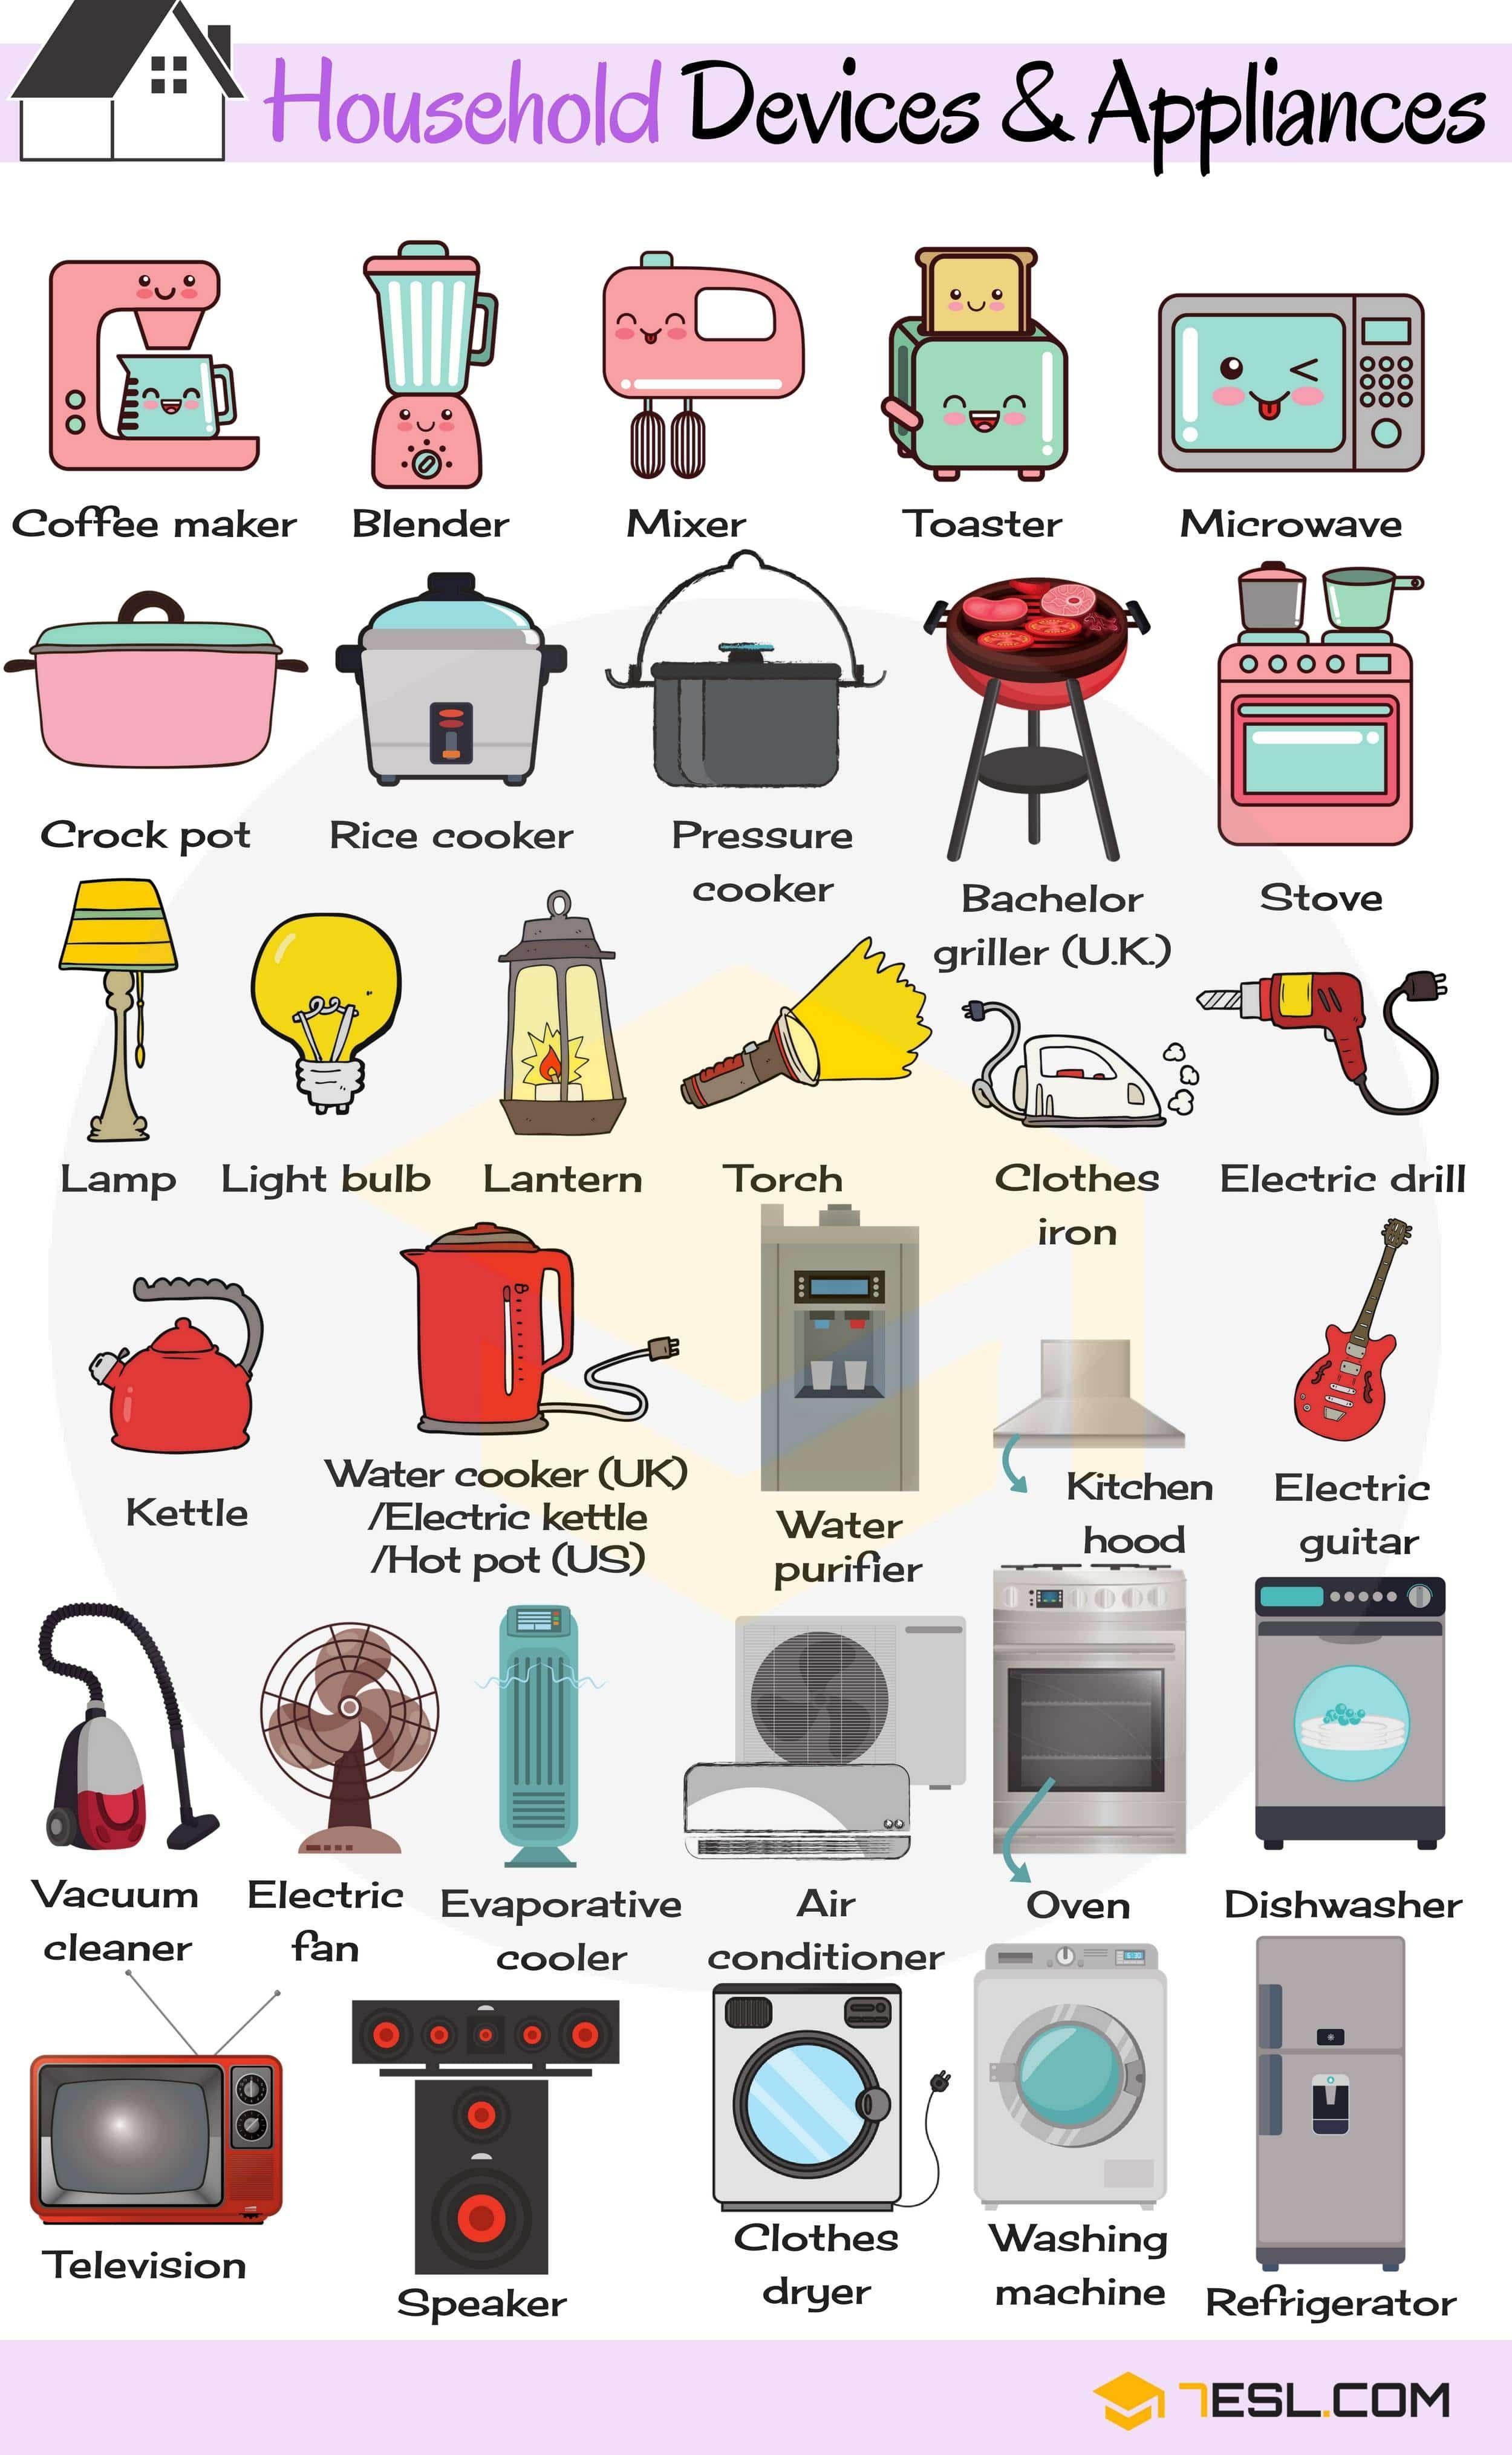 Household Appliances Useful Home Appliances List With Pictures Appliances Useful Appliances In 2020 English Vocabulary Learn English Vocabulary Learn English